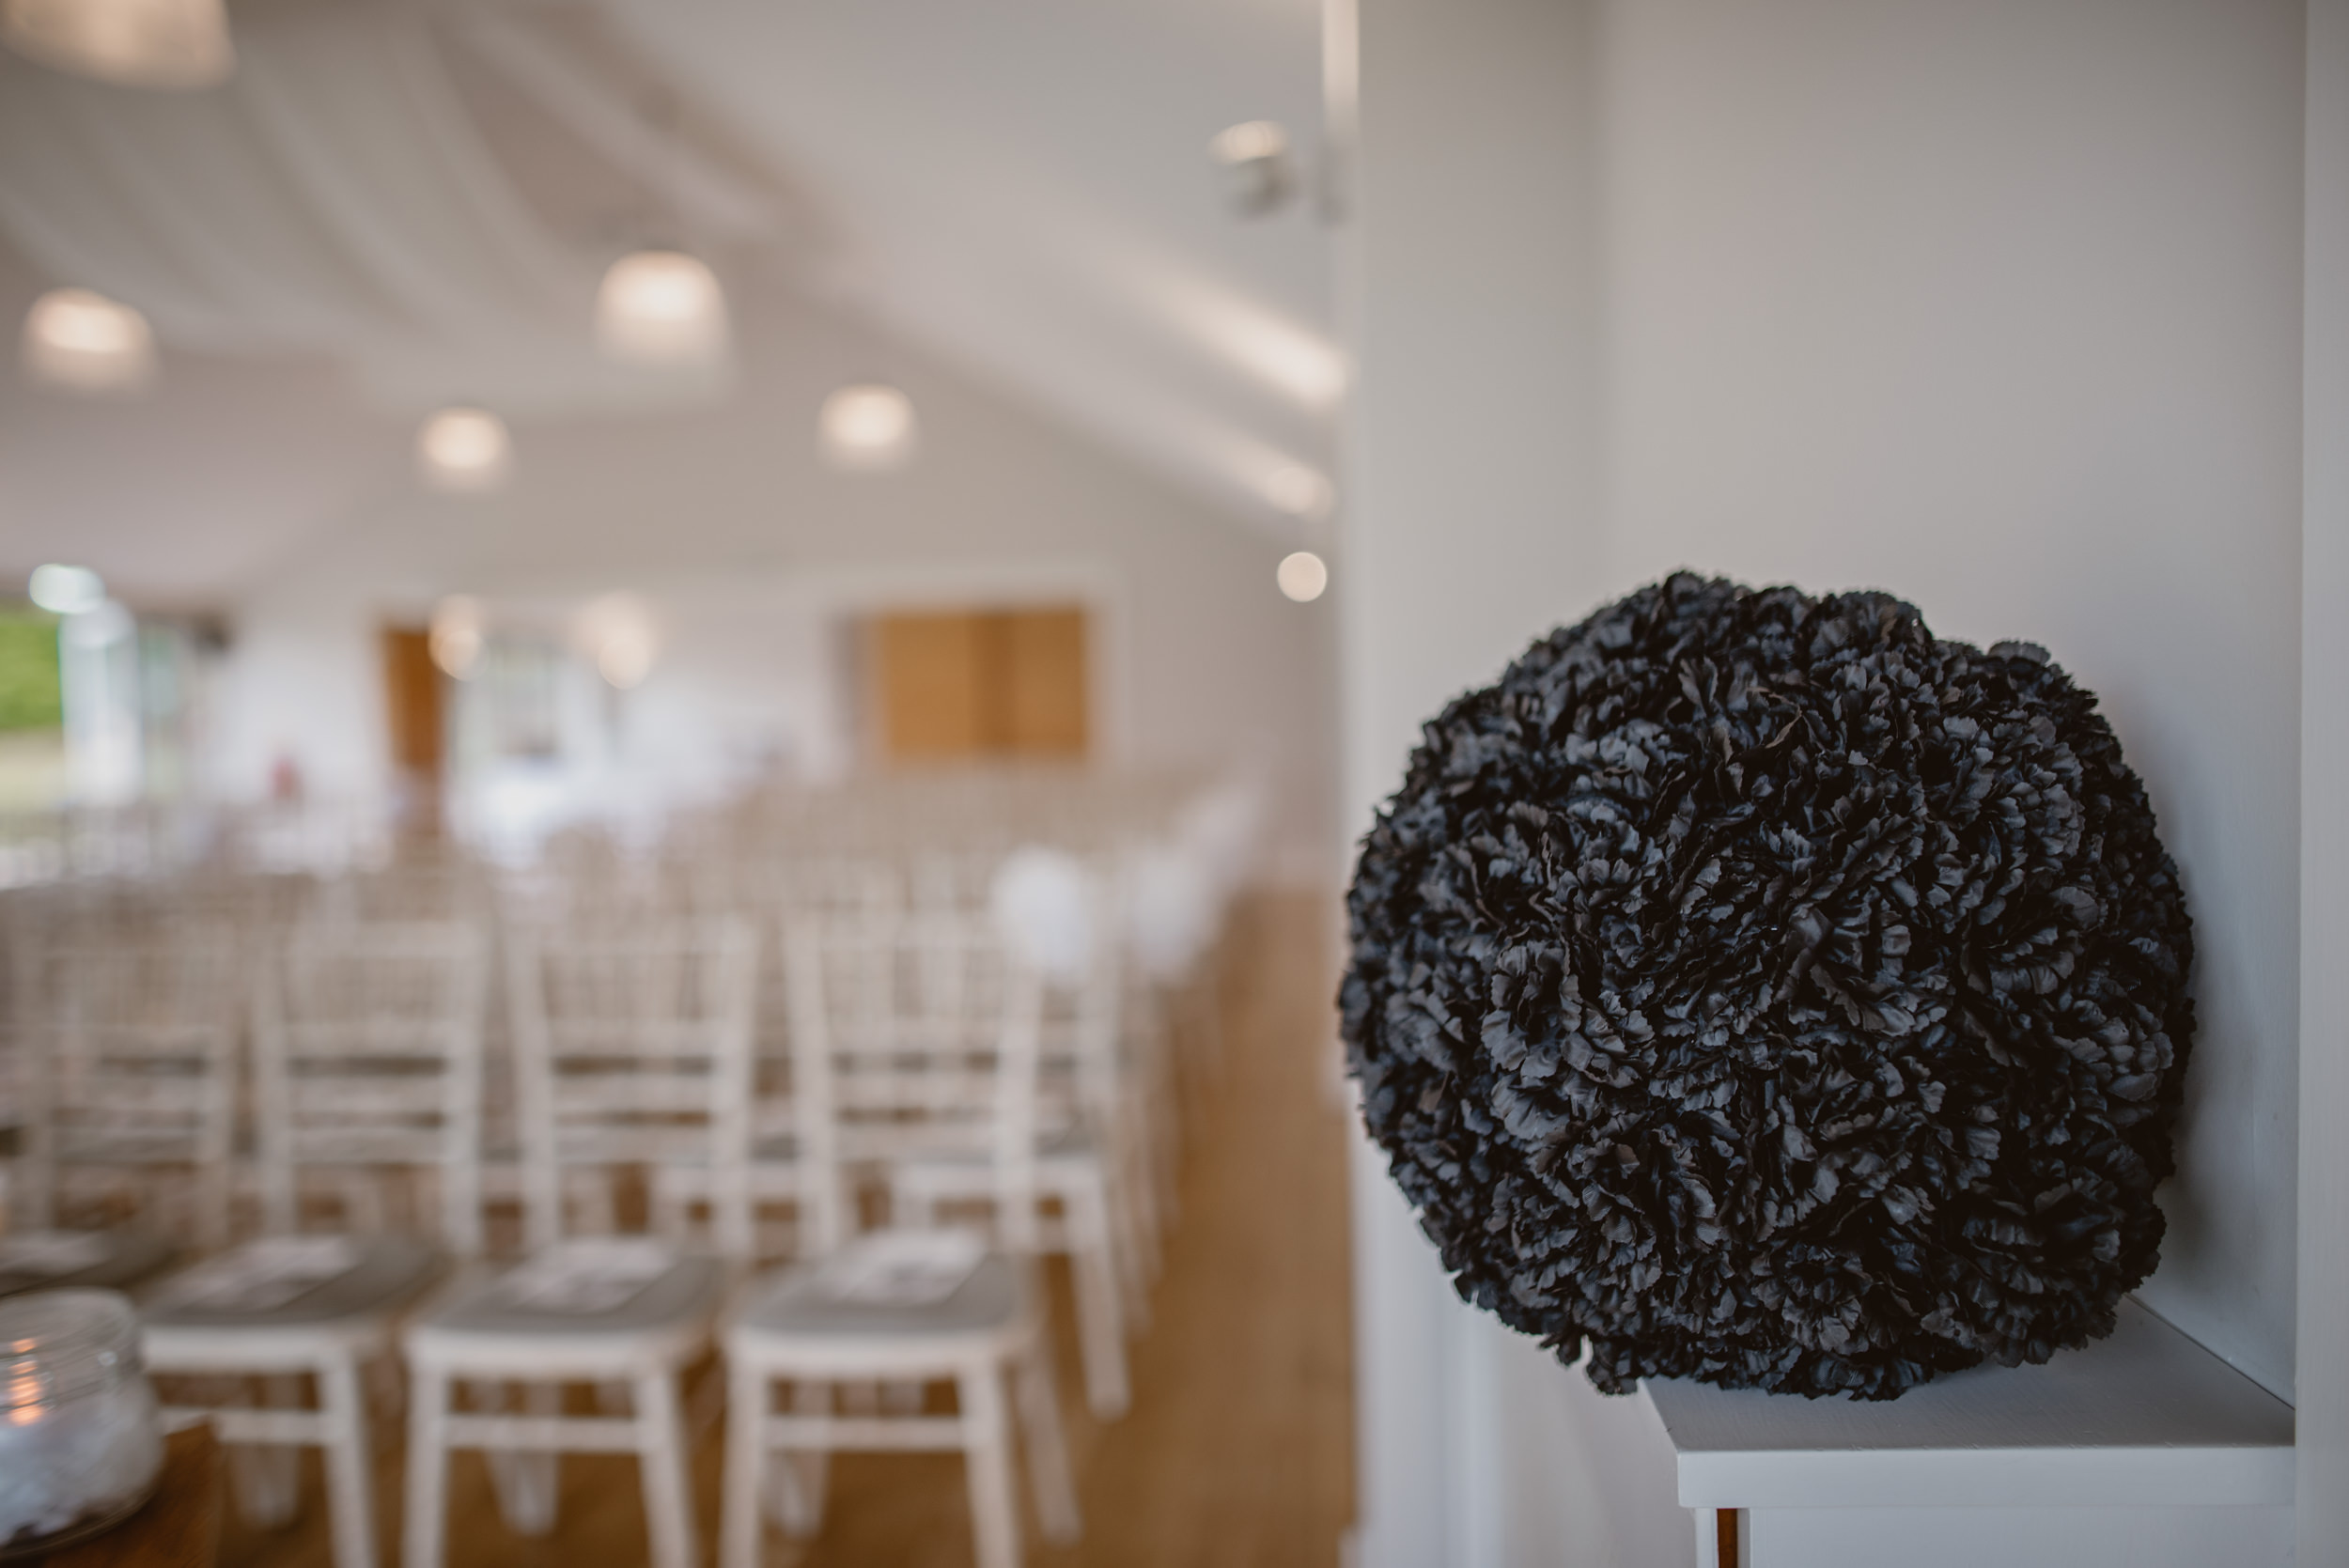 Barry-and-Chaz-wedding-Wasing-Park-Berkshire-Manu-Mendoza-Wedding-Photography-009.jpg